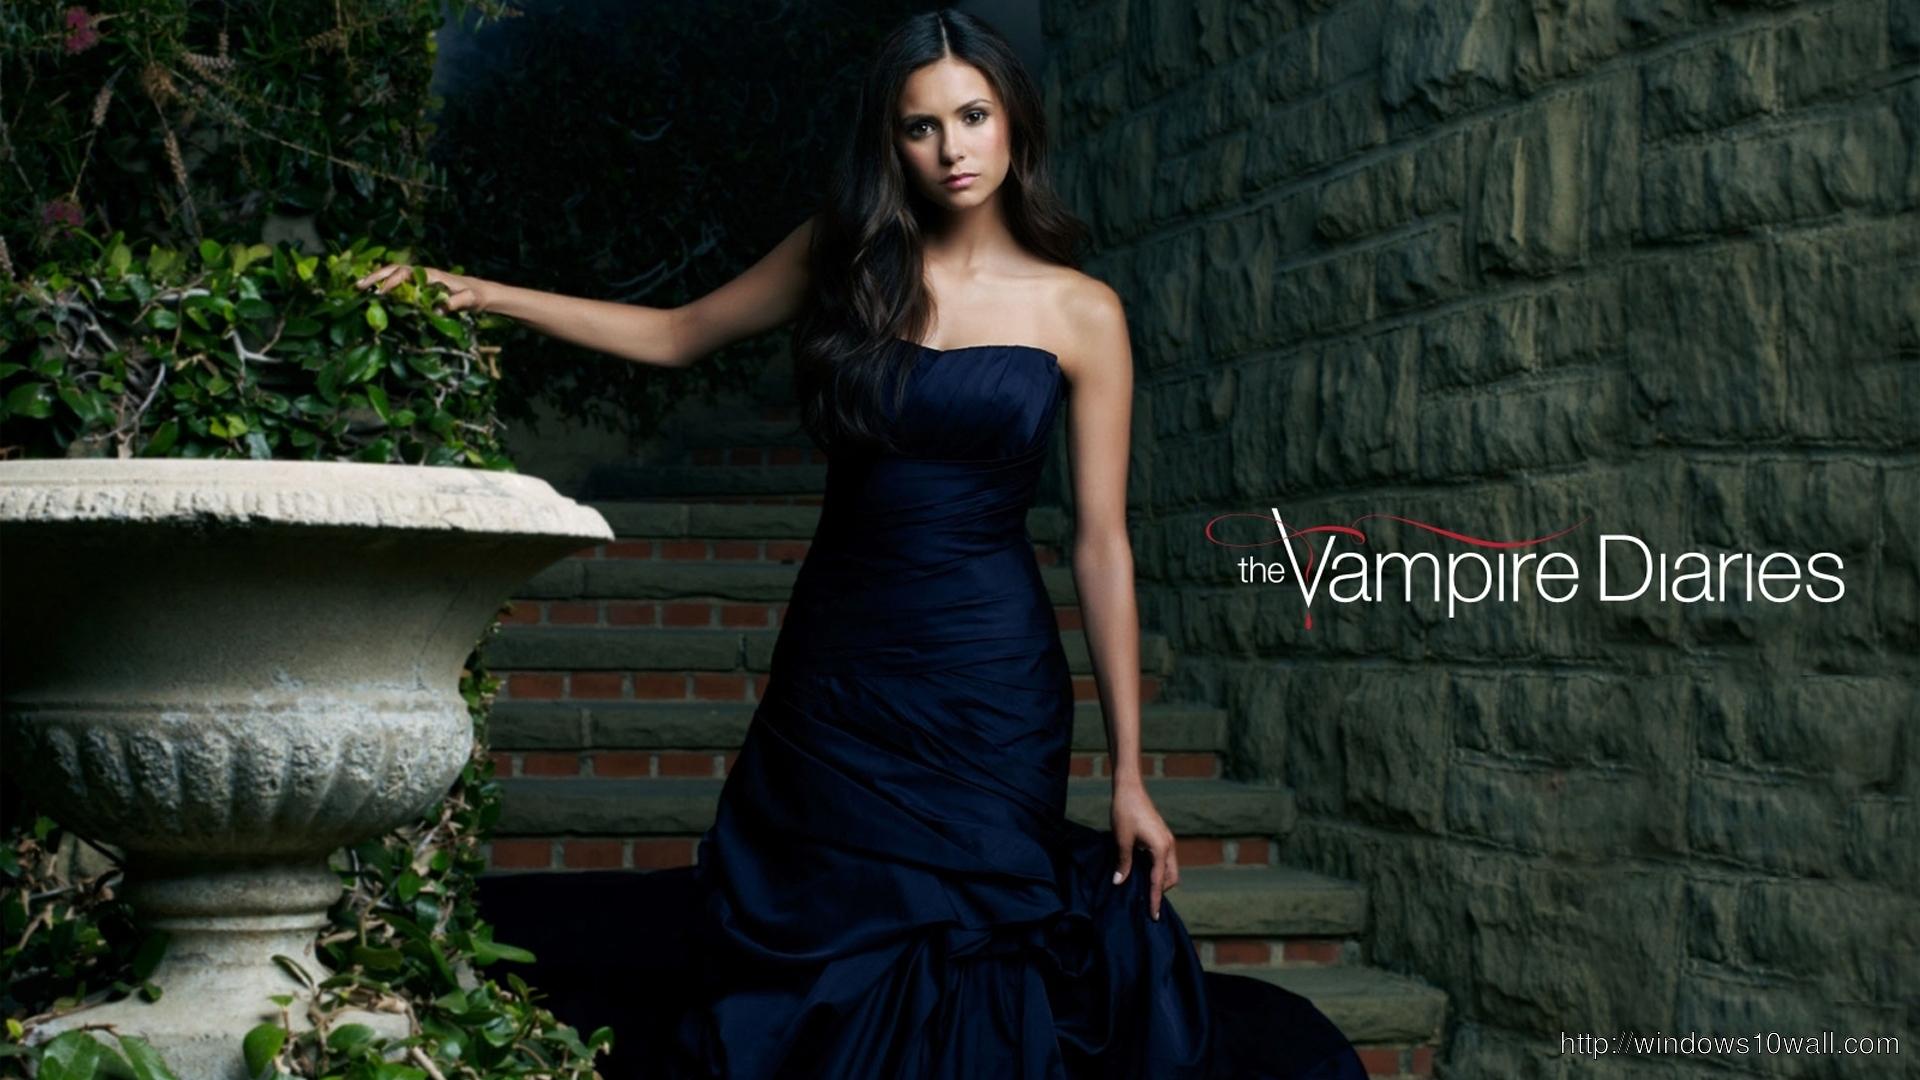 Nina Dobrev Vampire Diaries Actress Wallpaper